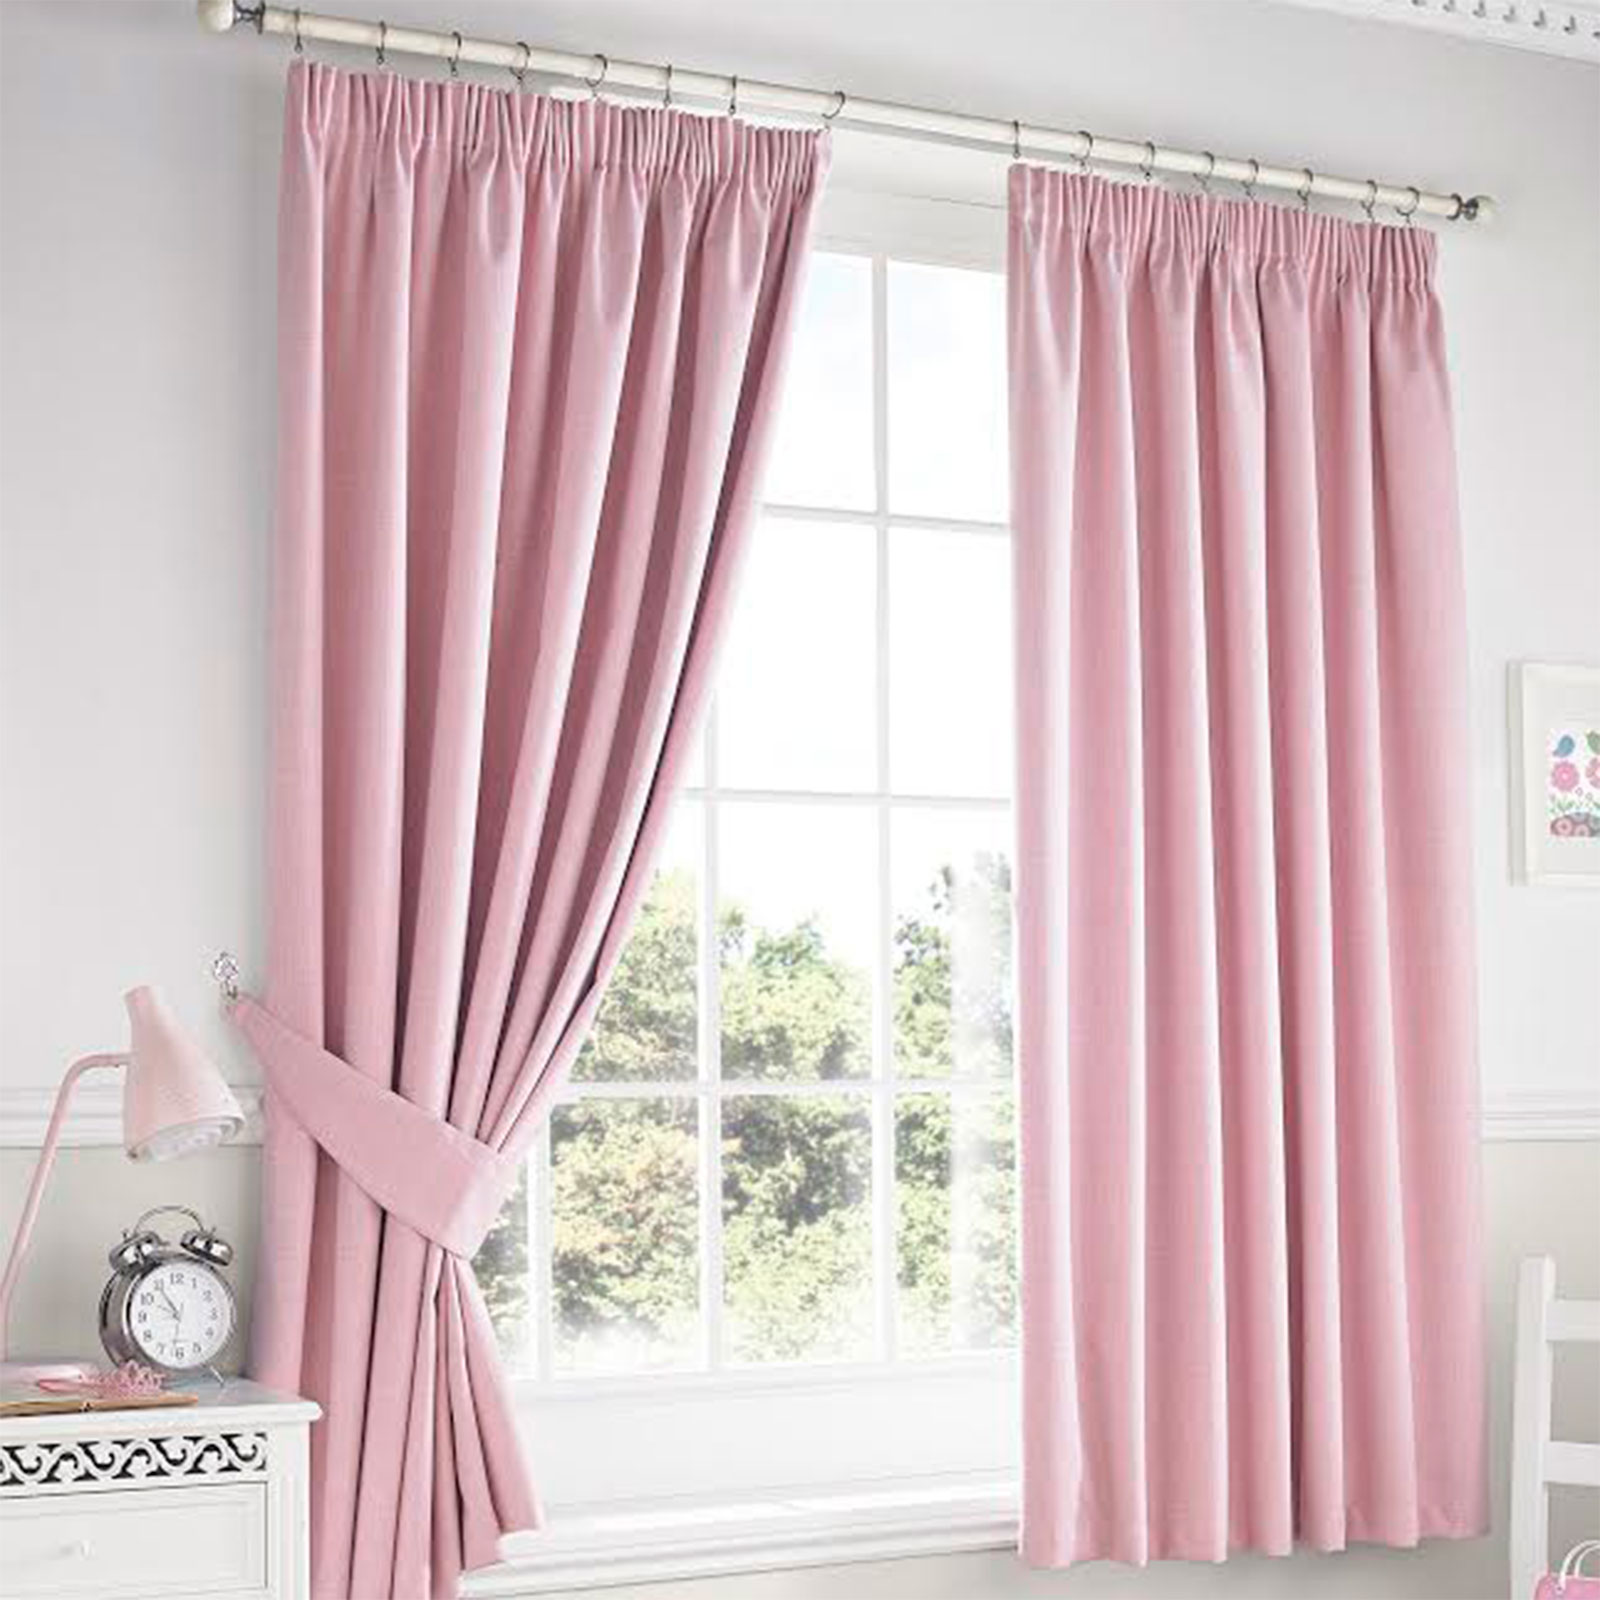 modern plain darwin blackout pencil pleat curtains pair. Black Bedroom Furniture Sets. Home Design Ideas